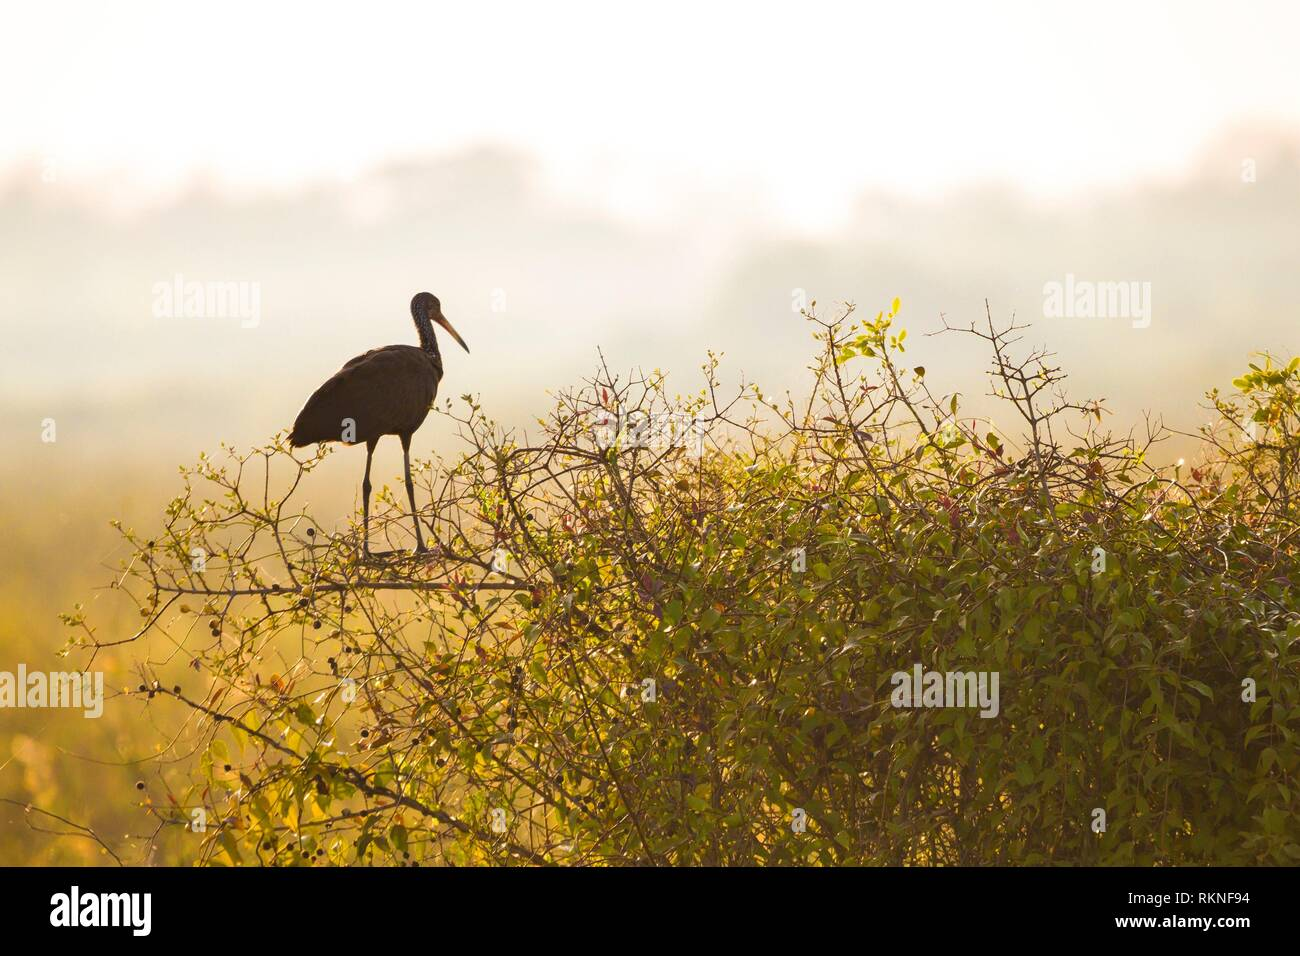 Limpkin, Aramus guarauna, Mato Grosso, Pantanal, Brazil. Stock Photo